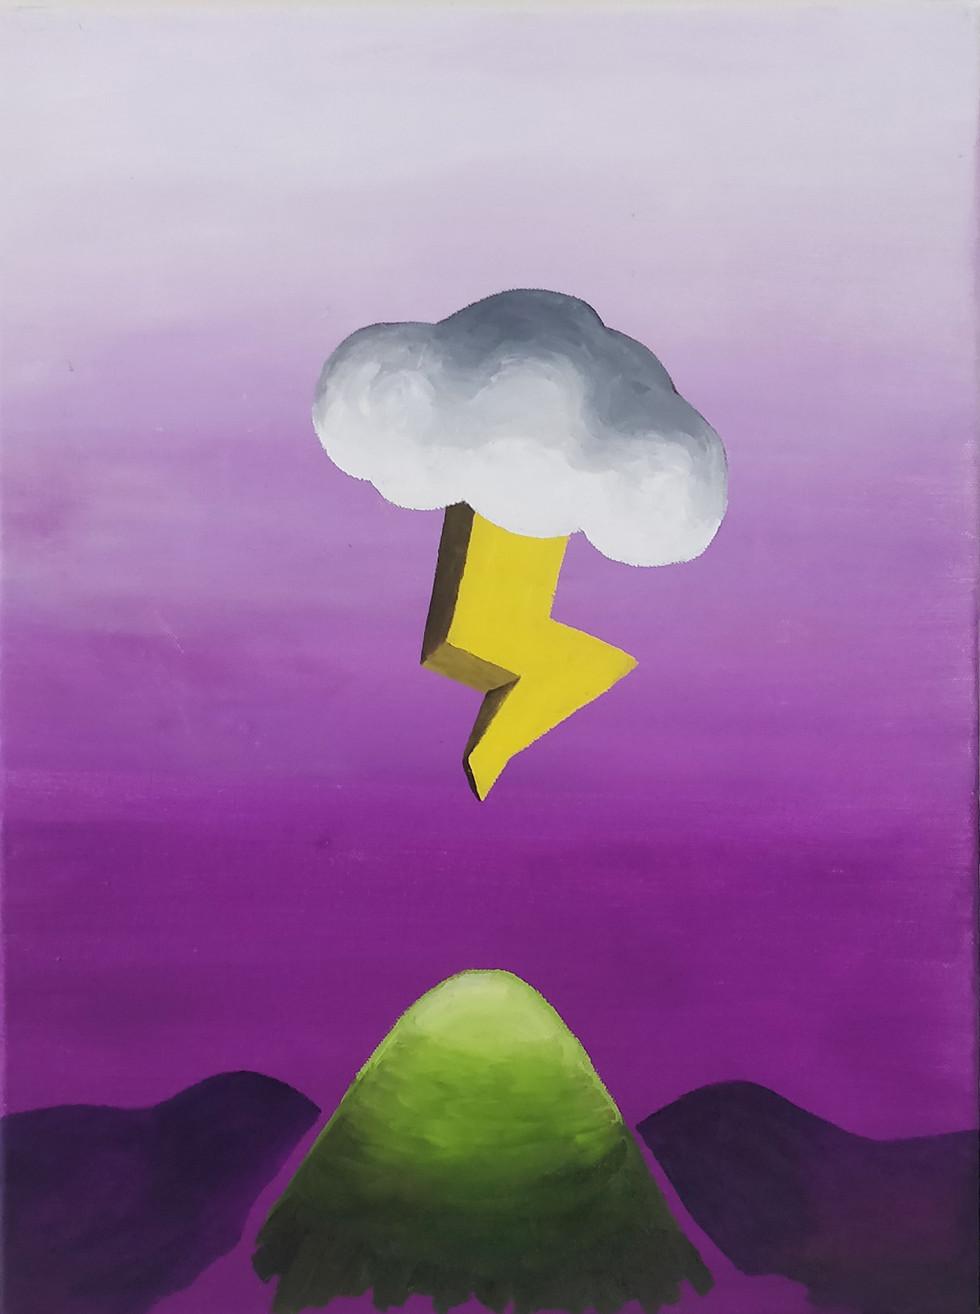 Recharging Mountain 2020   Oil on canvas.   40 cm x 30 cm x 2 cm  Contacts: hugolamip@gmail.com 00351913251338